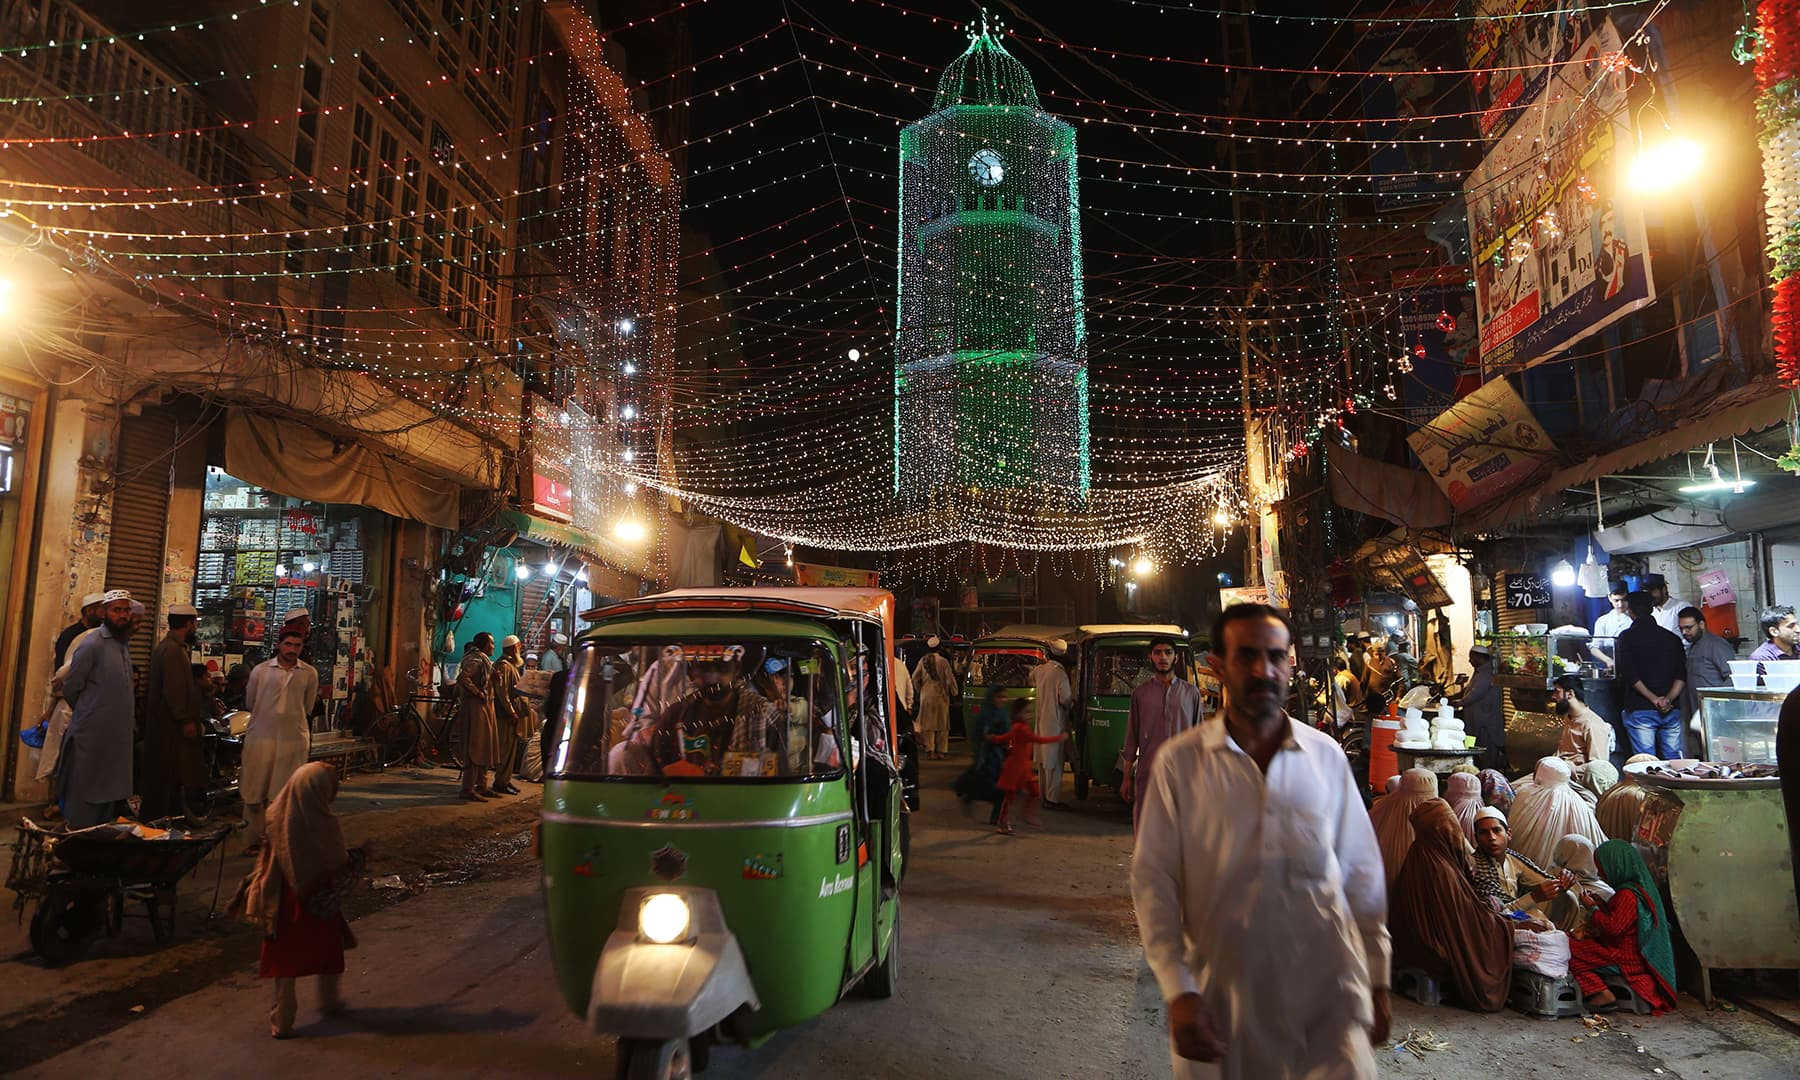 Pedestrians walk along an illuminated street ahead of celebrations for Eid-i-Miladun Nabi in Peshawar on October 29. — AFP